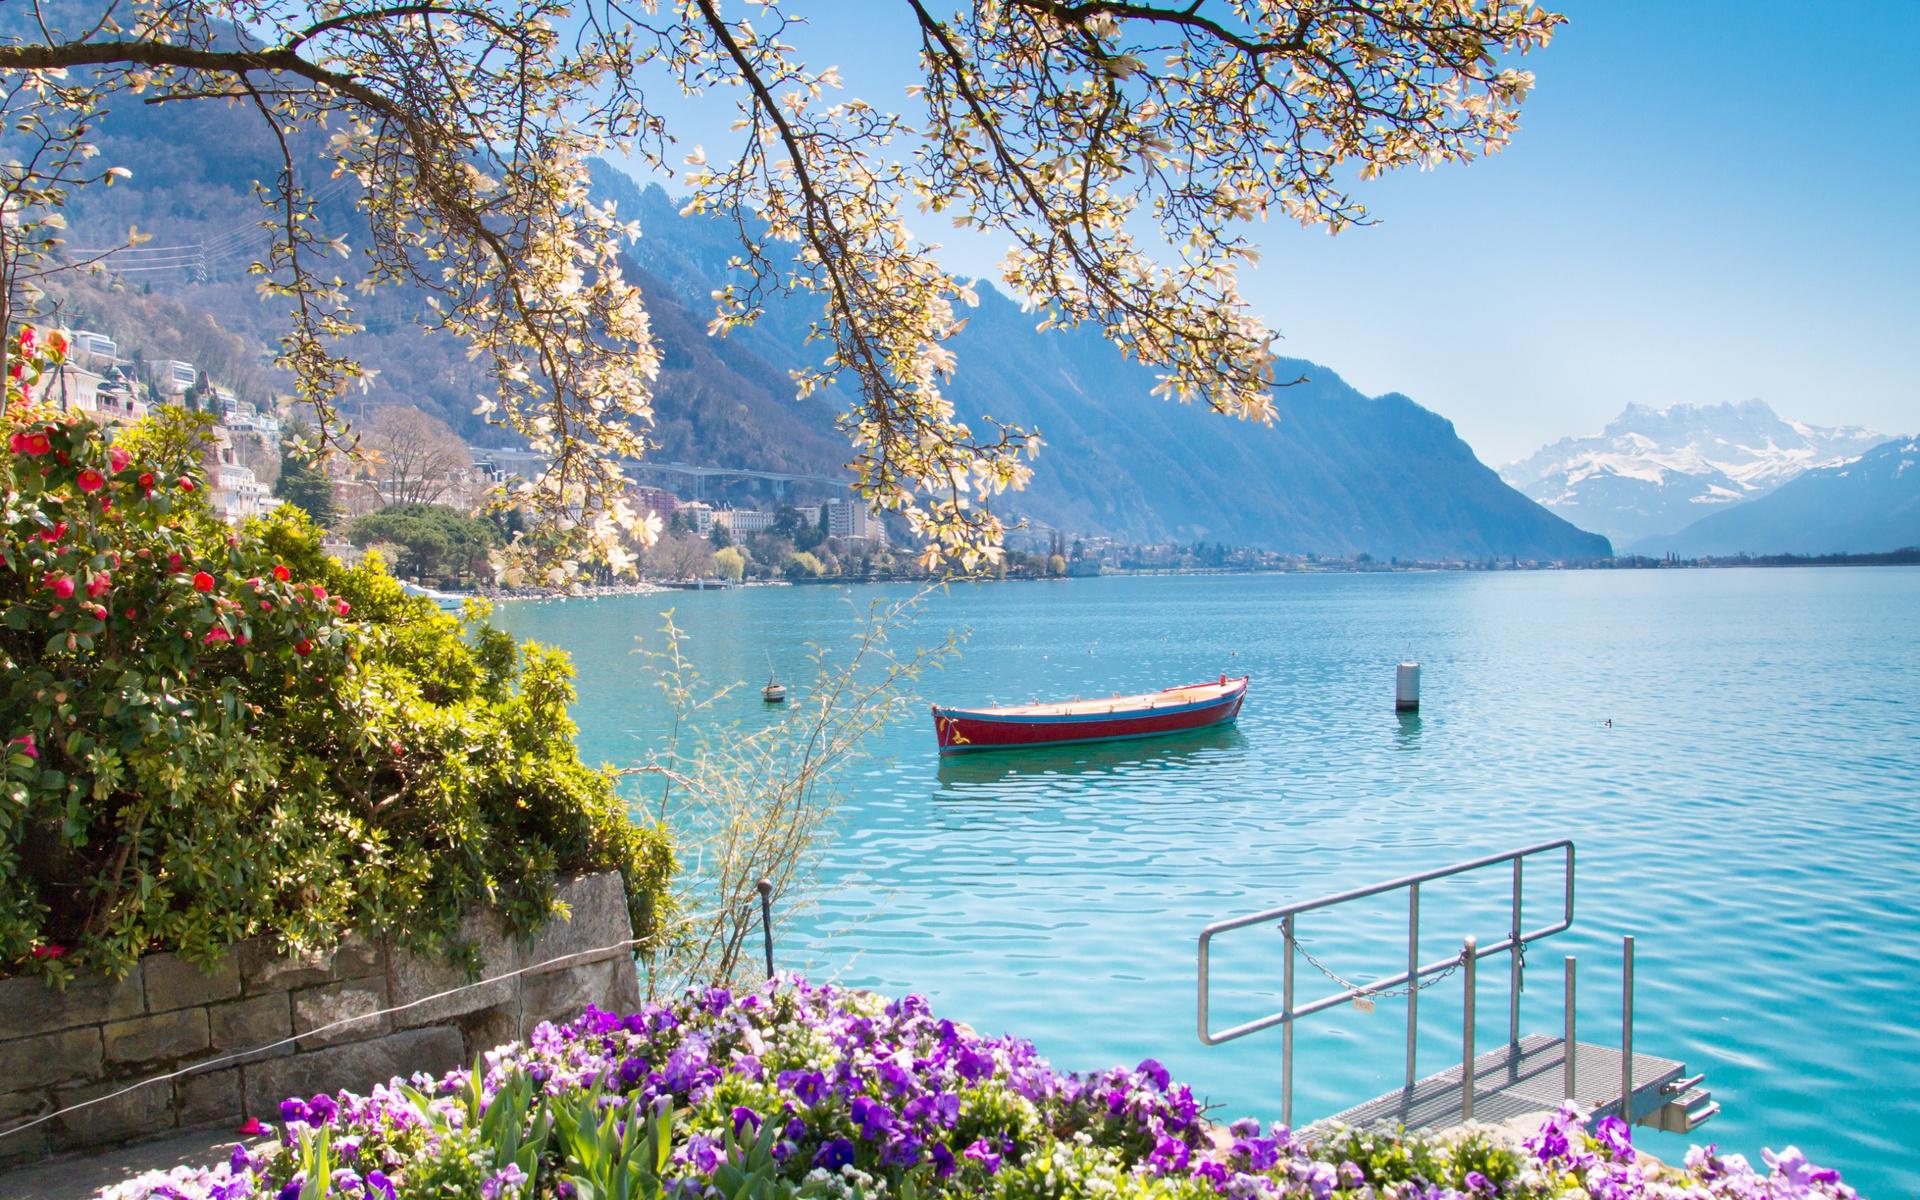 lake geneva, montreux, alps, morning, beautiful lake, flowers, mountain landscape, montreux cityscape, switzerland